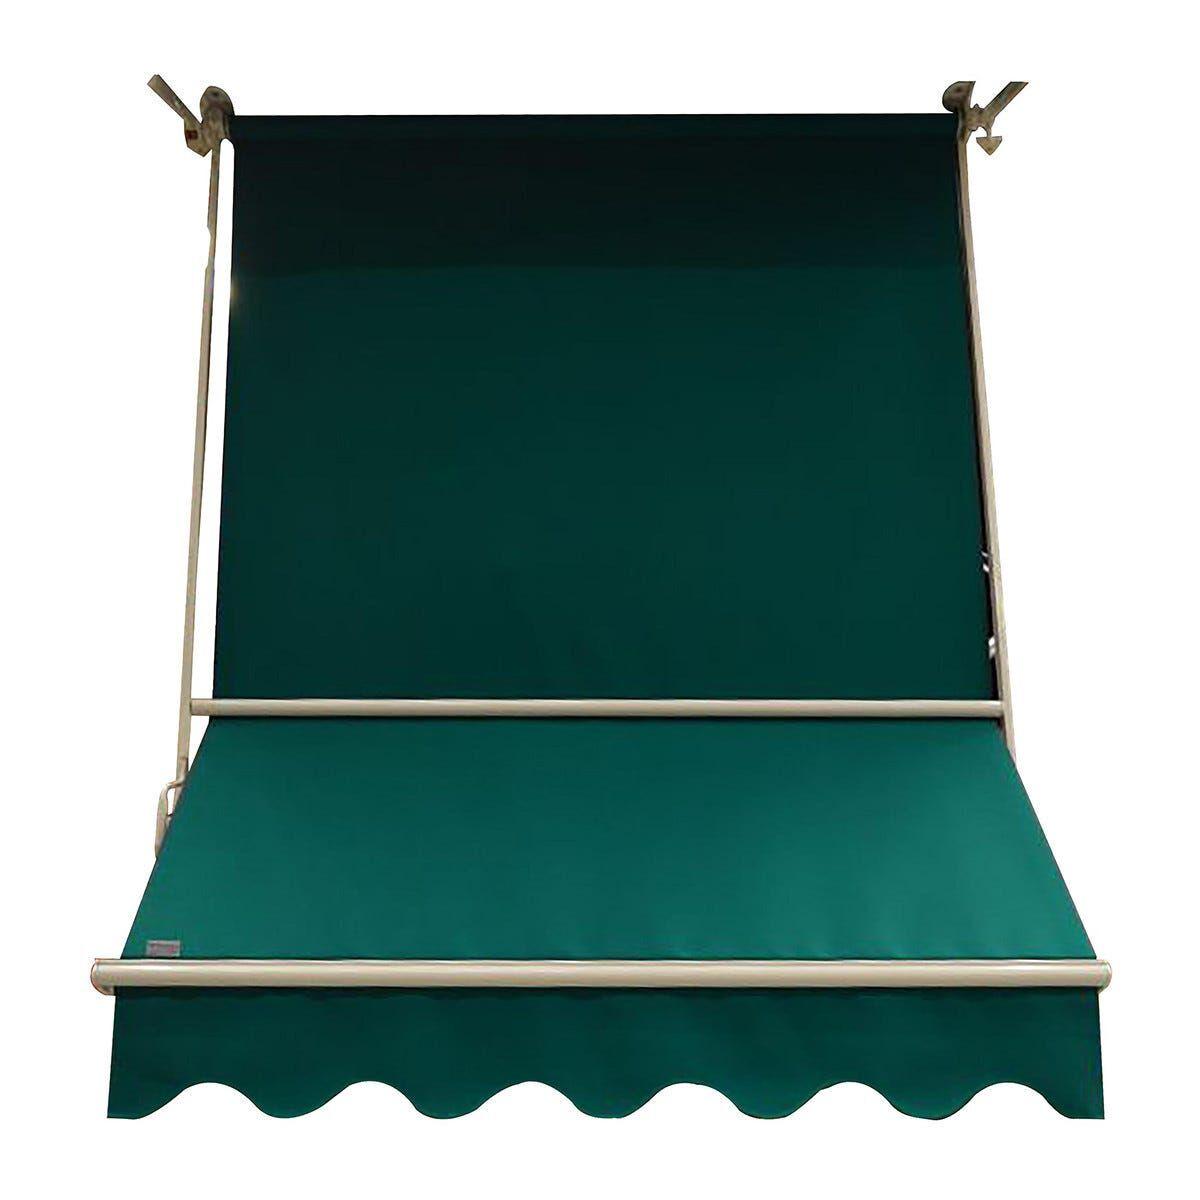 Tenda Da Sole A Caduta Genova Verde Tinta Unita  200x250 Cm (Lxh)